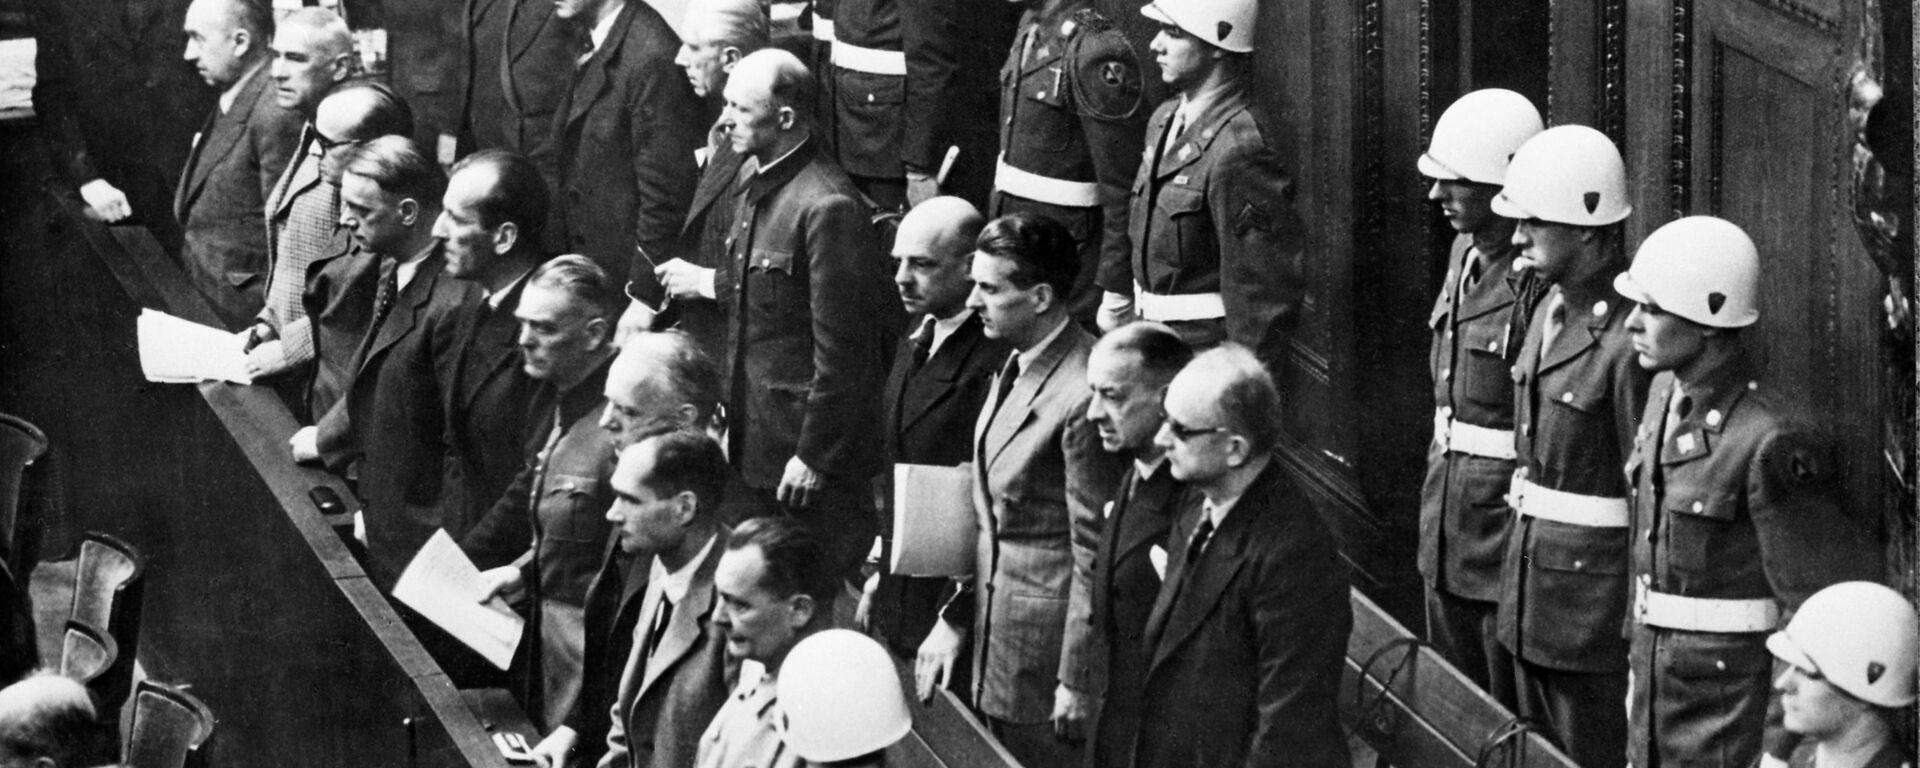 Нюрнбергский процесс (20 ноября 1945 г. - 1 октября 1946 г.) - Sputnik Latvija, 1920, 09.05.2021